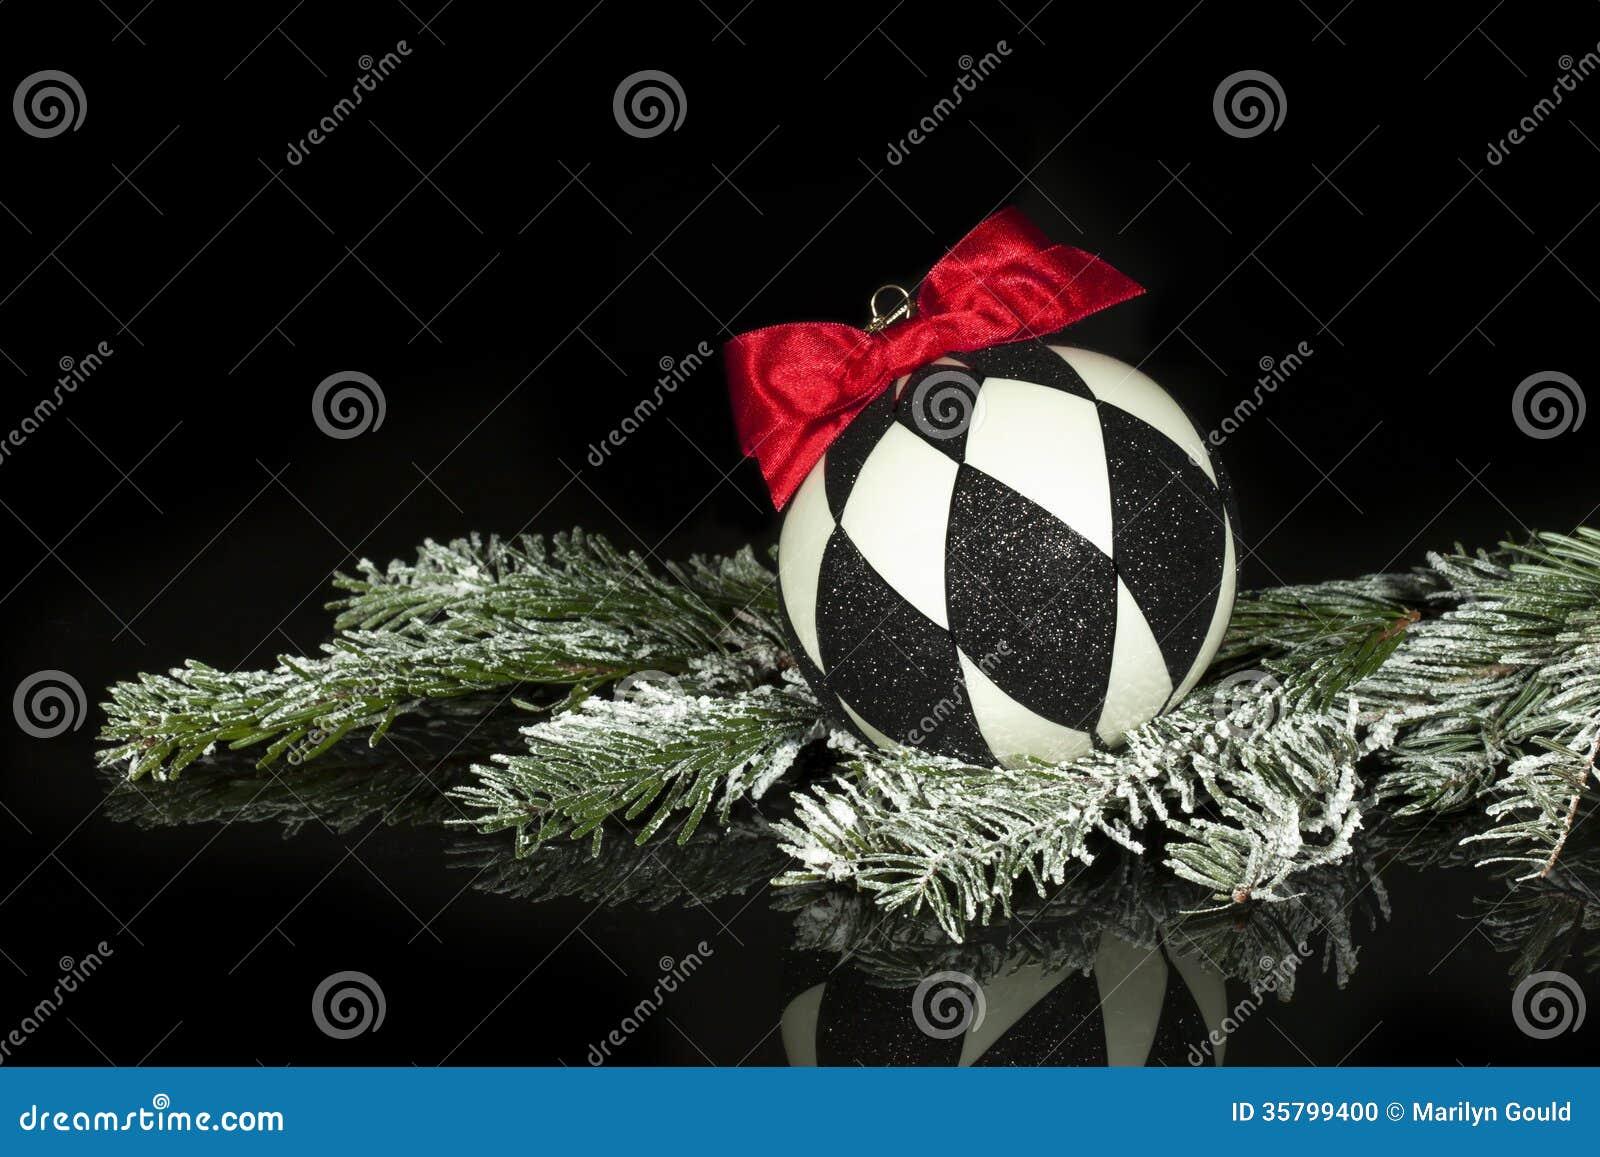 black white christmas ornament - Black Red White Christmas Decorations